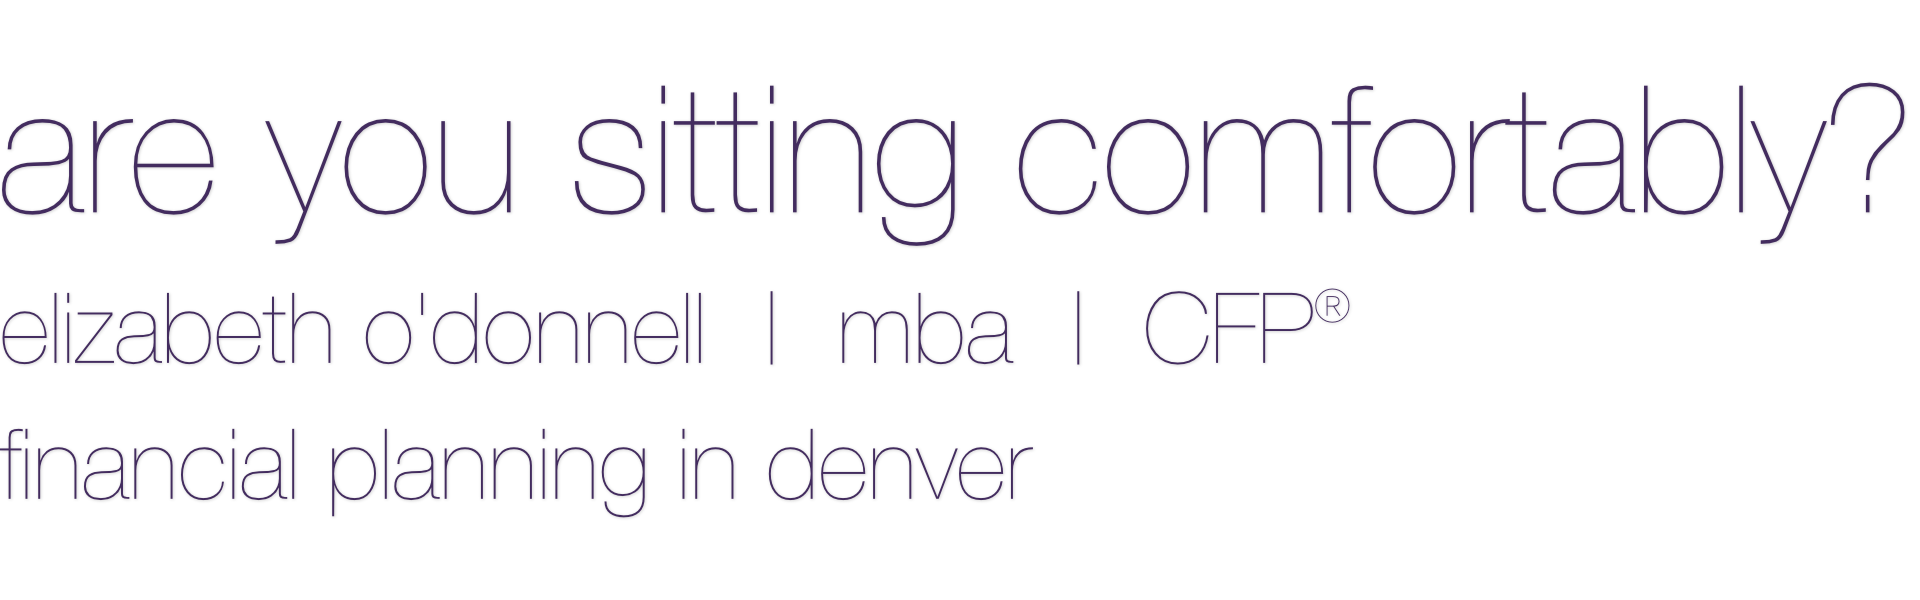 Elizabeth O'Donnell, CERTIFIED FINANCIAL PLANNER (tm) in Denver, Colorado. Specializing in retirement planning.